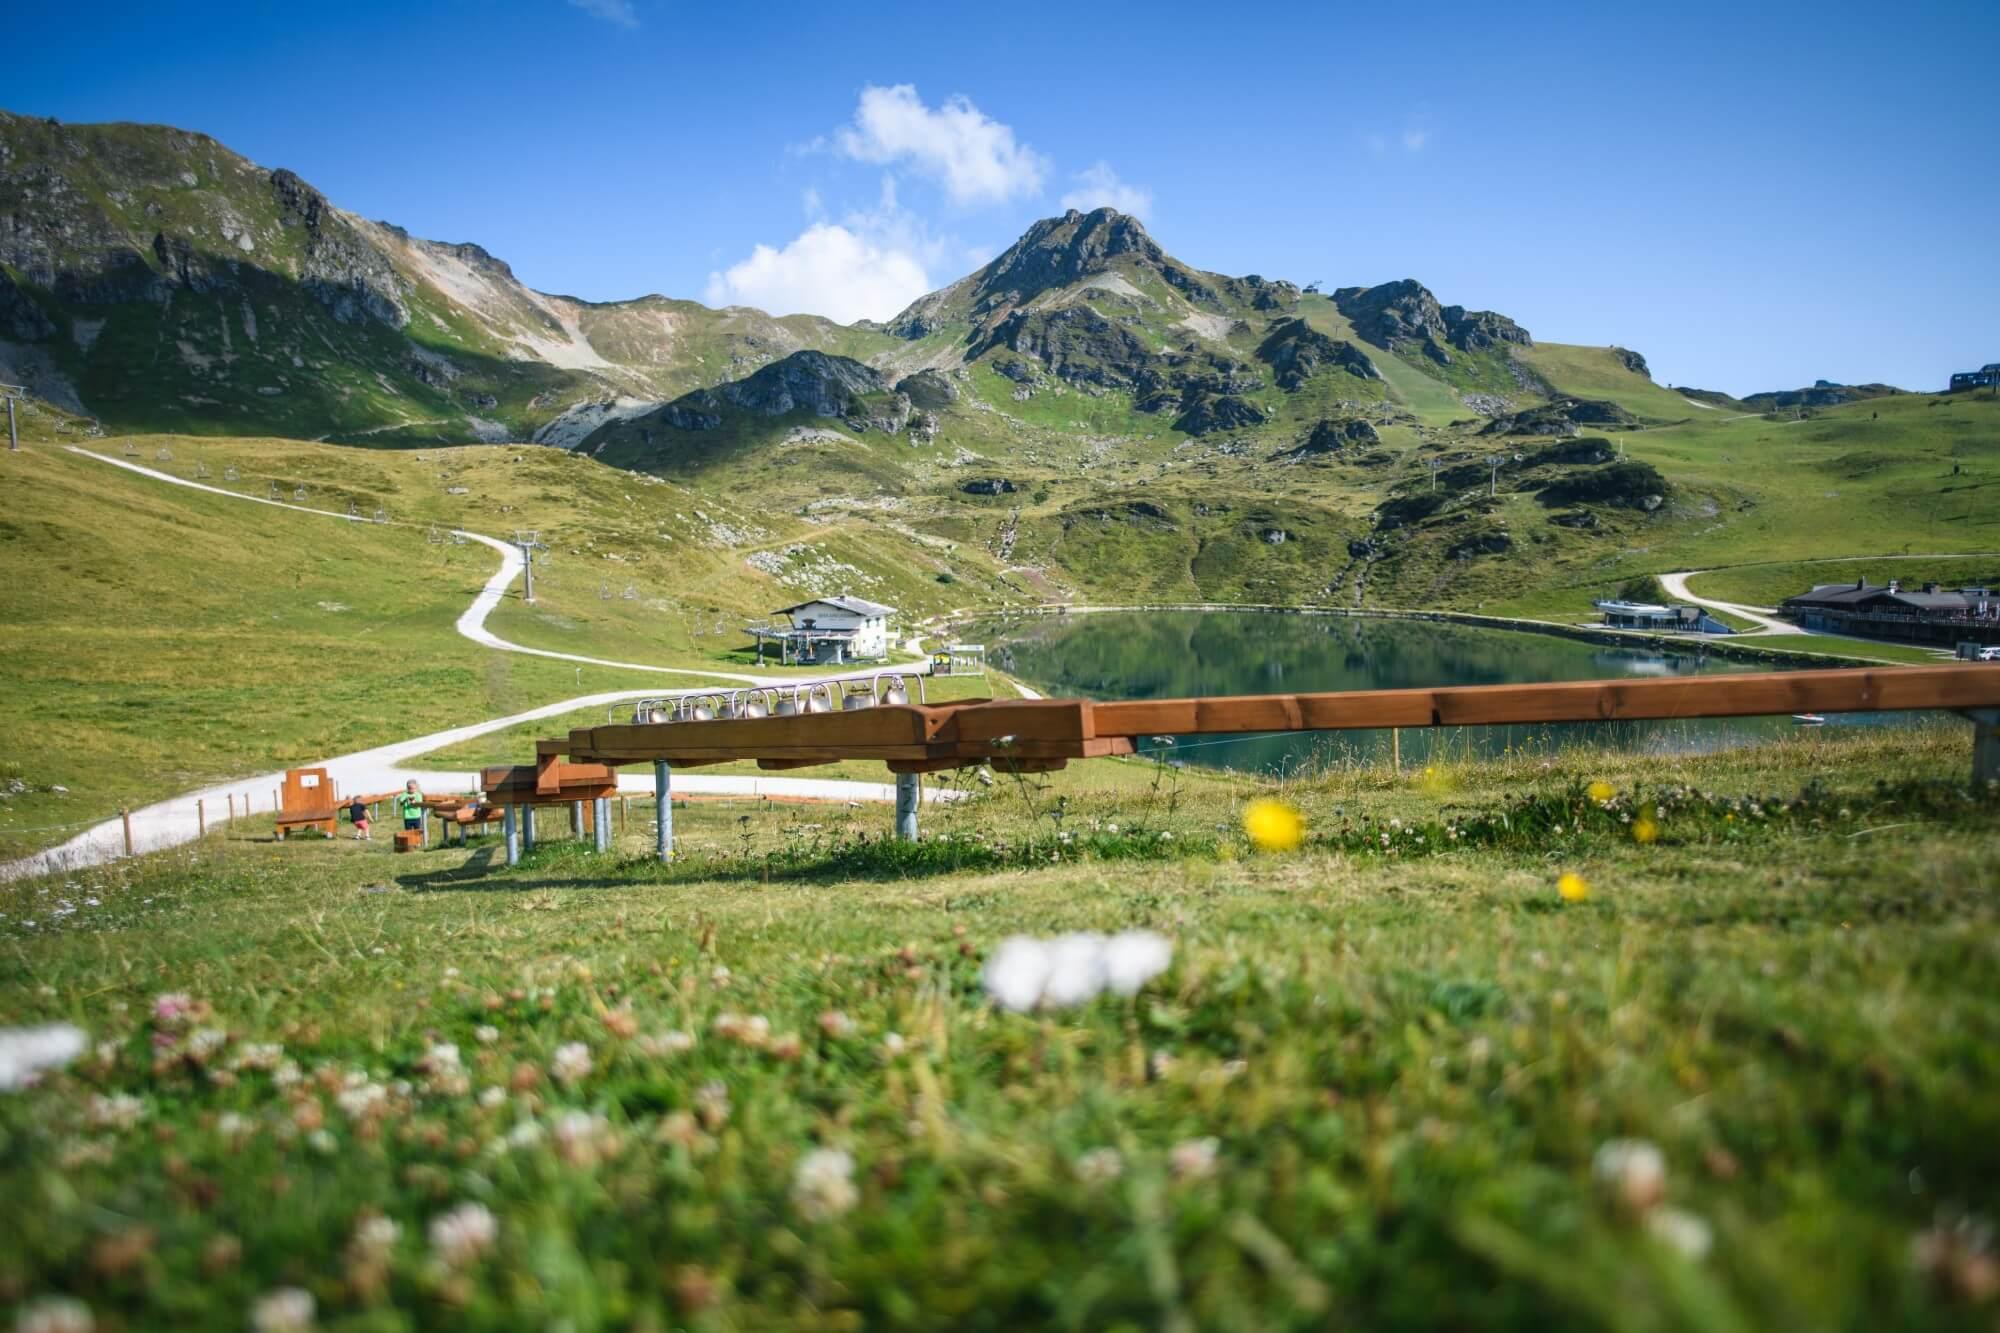 Kugelbahn in Obertauern